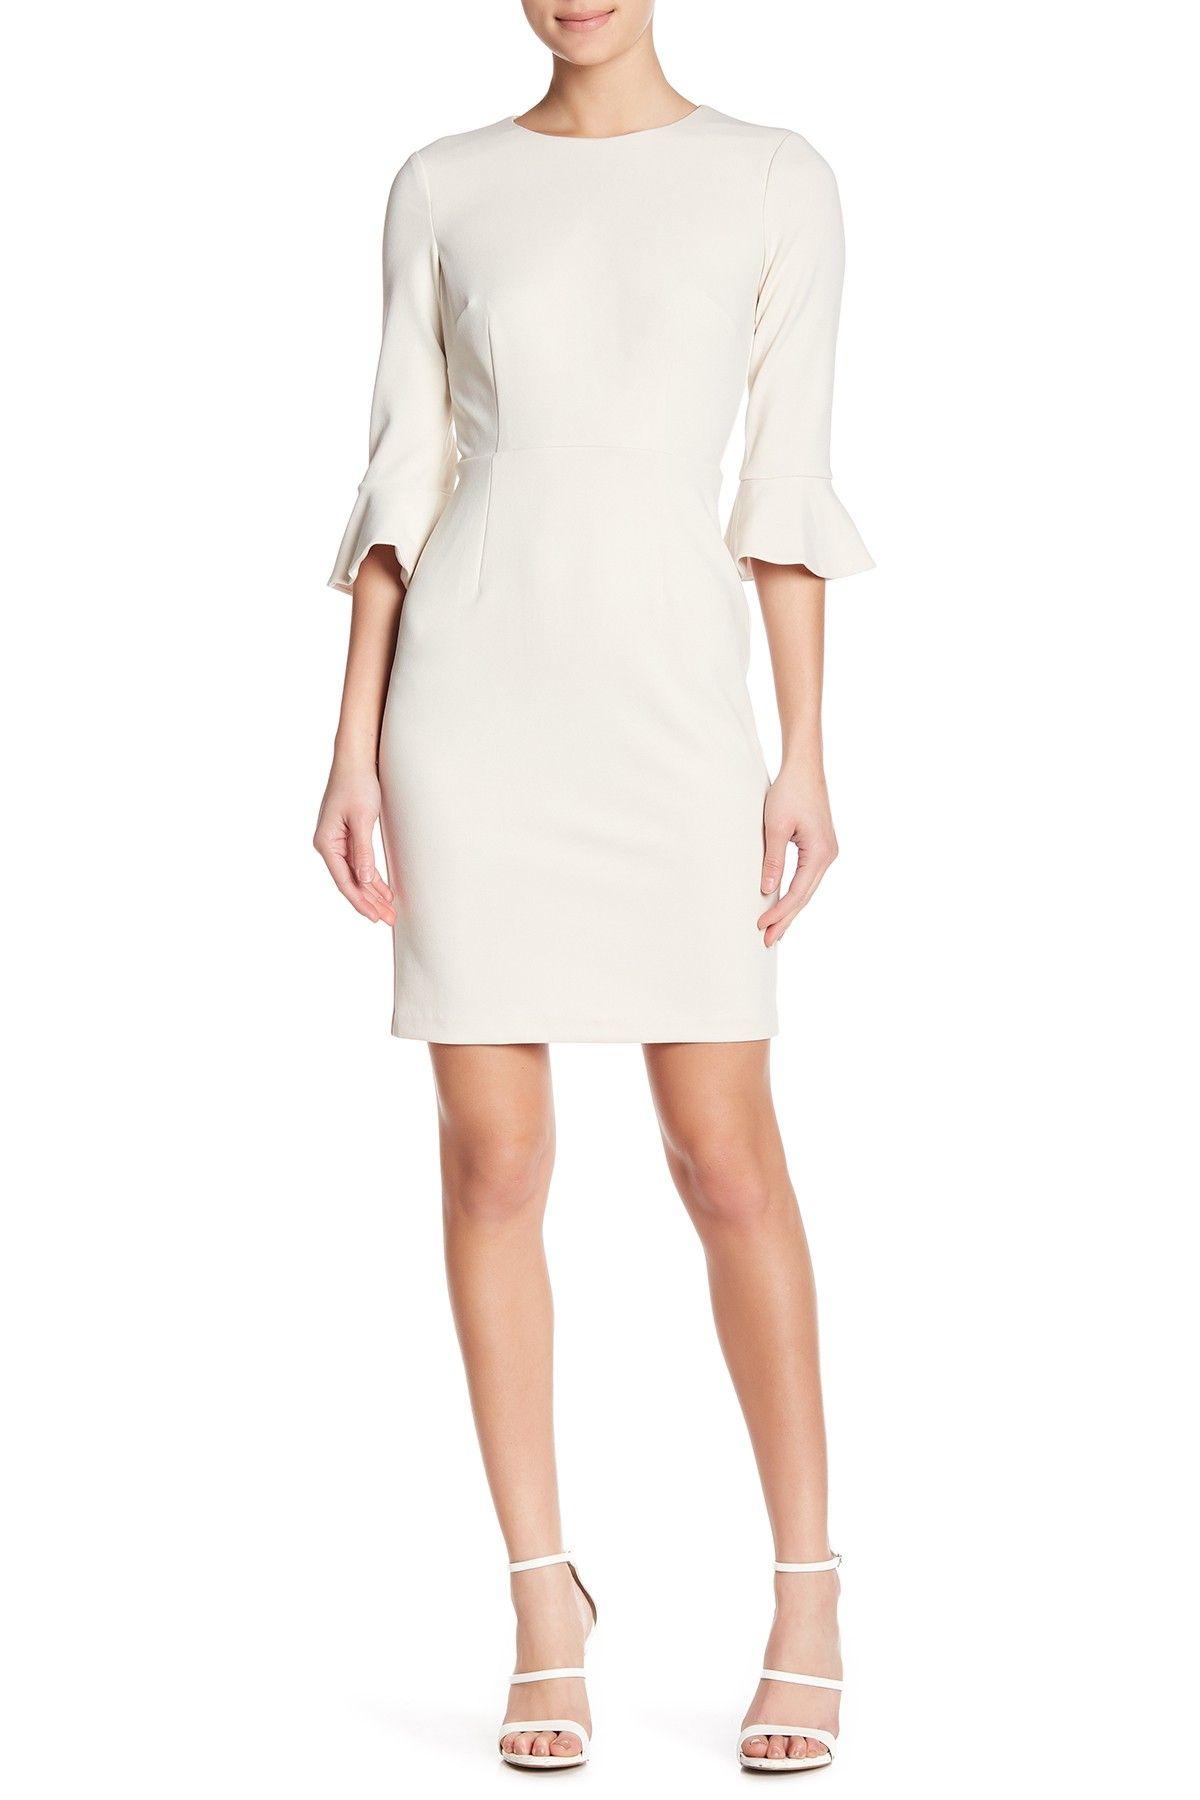 c0c97398 Donna Morgan | Ruffle Cuff Sheath Dress in 2019 | white dress ...